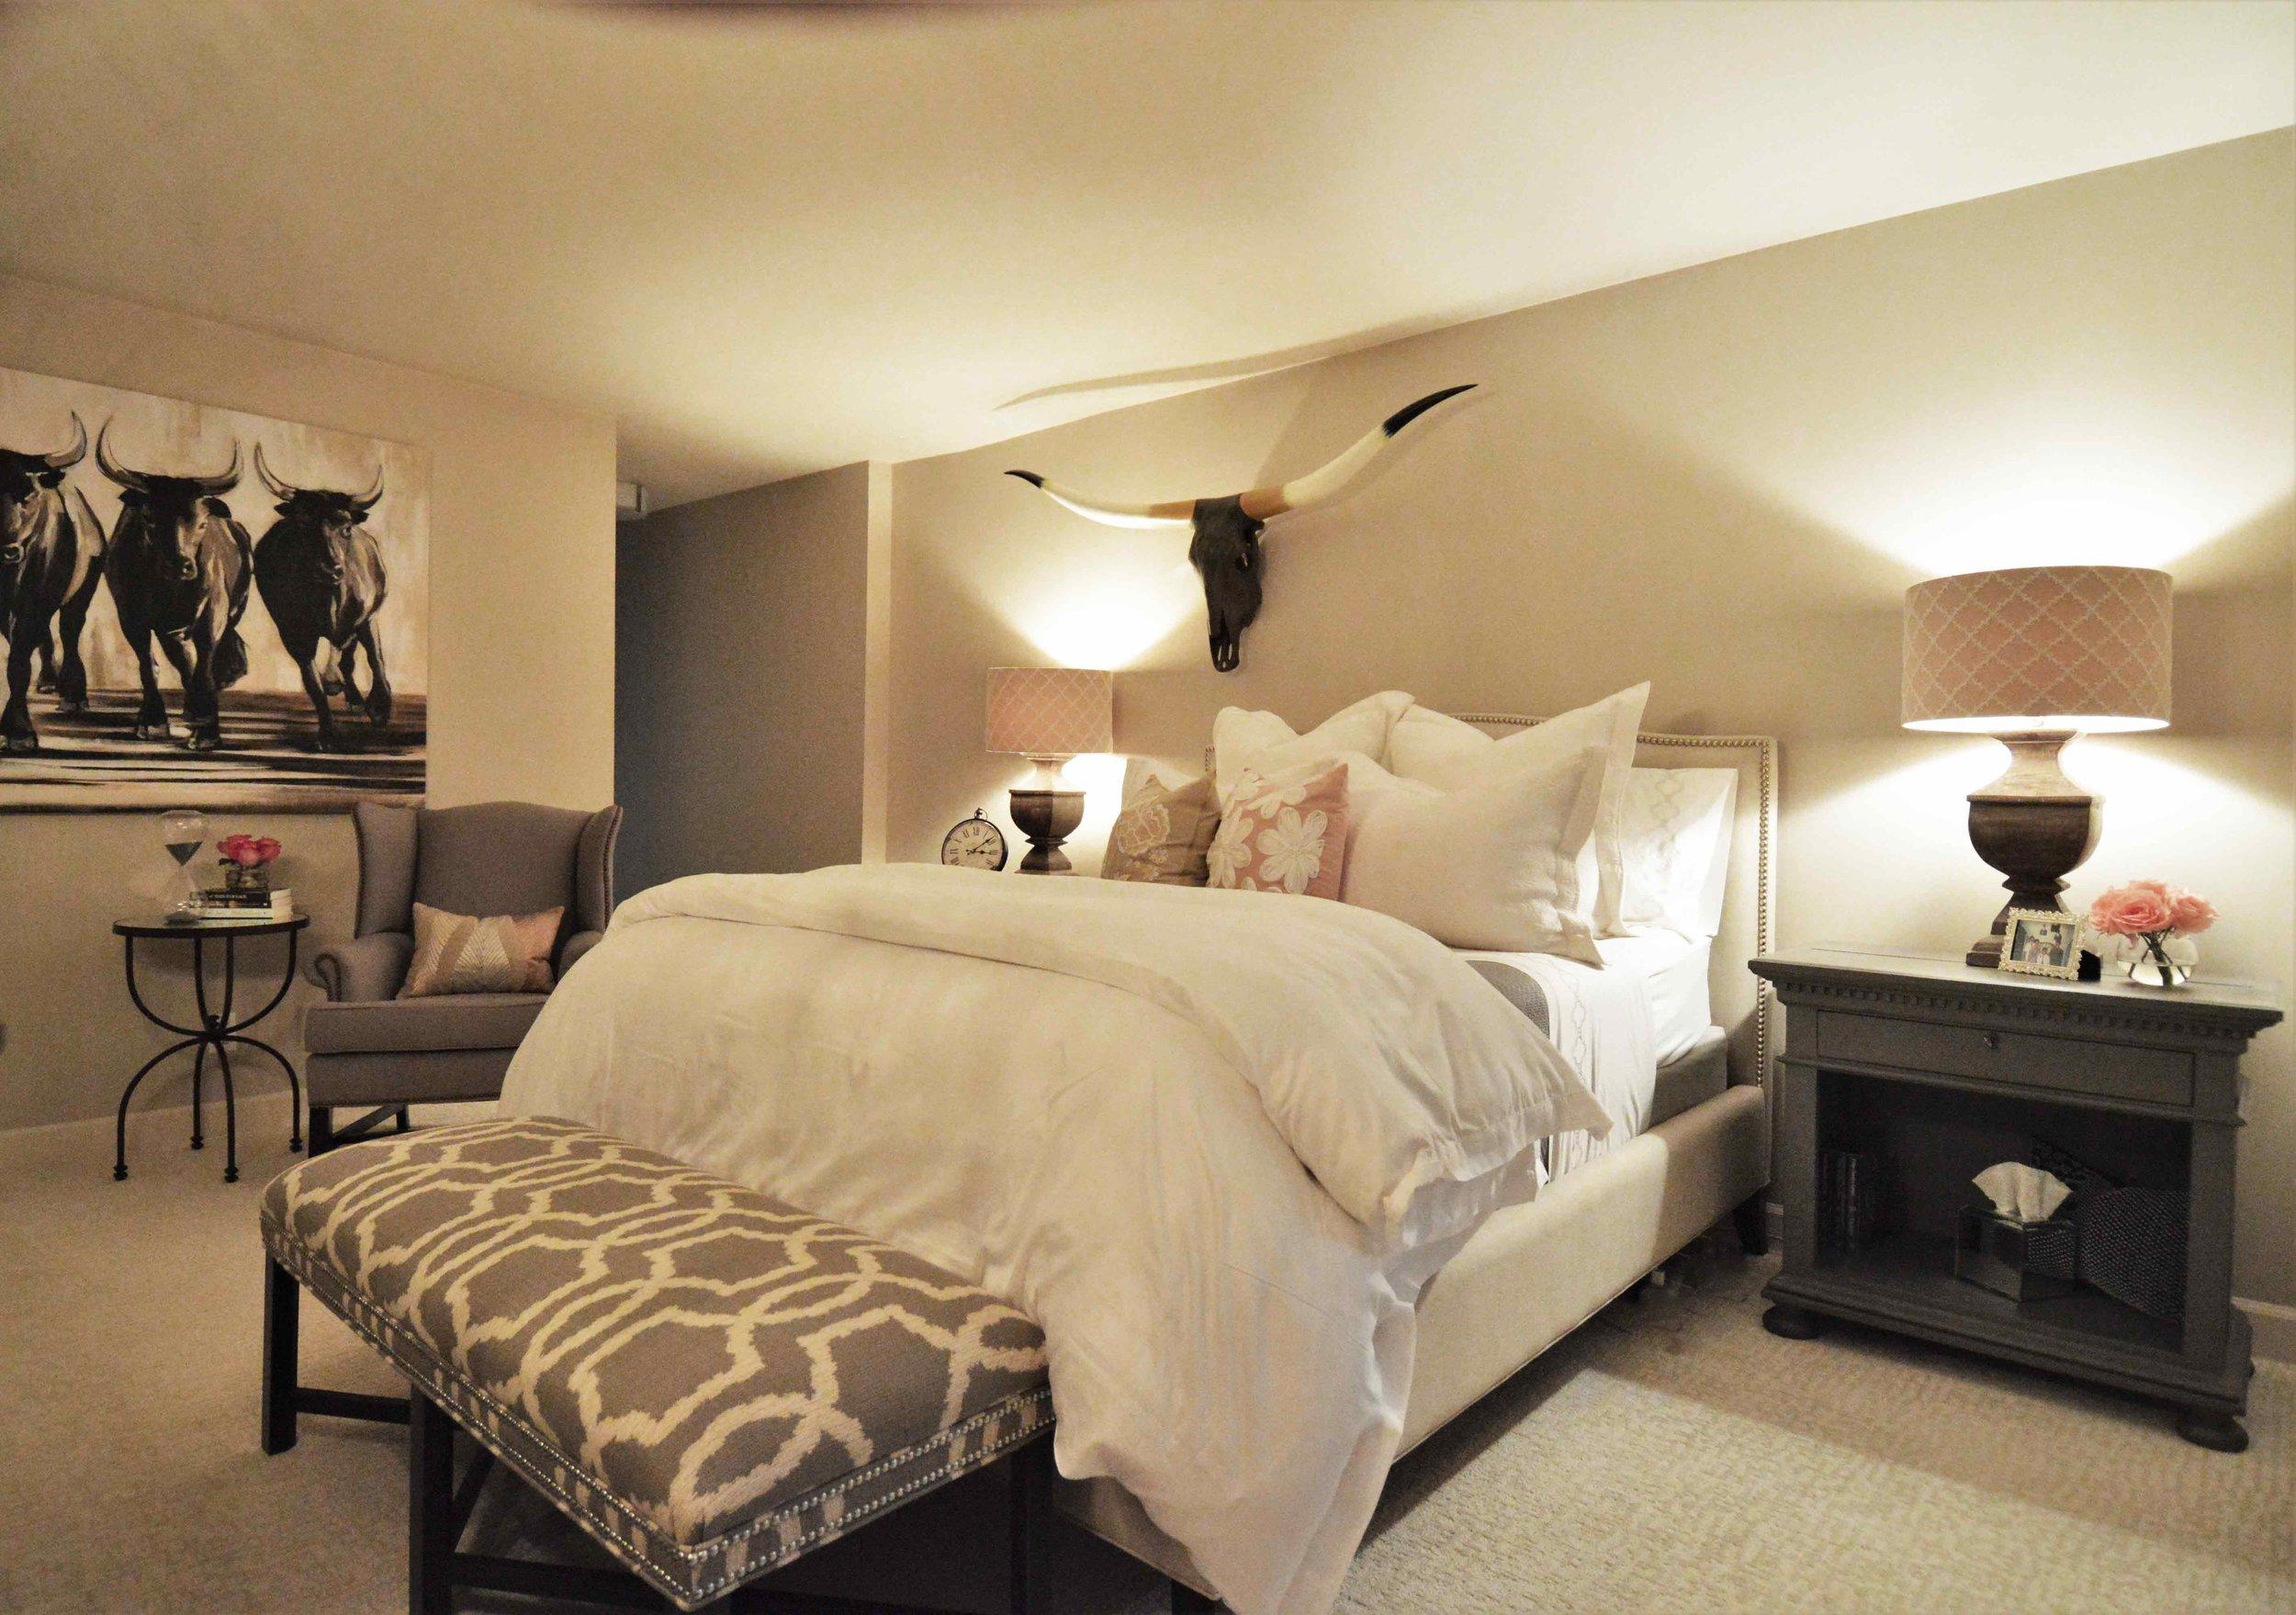 bedroom-3_optimized.jpg